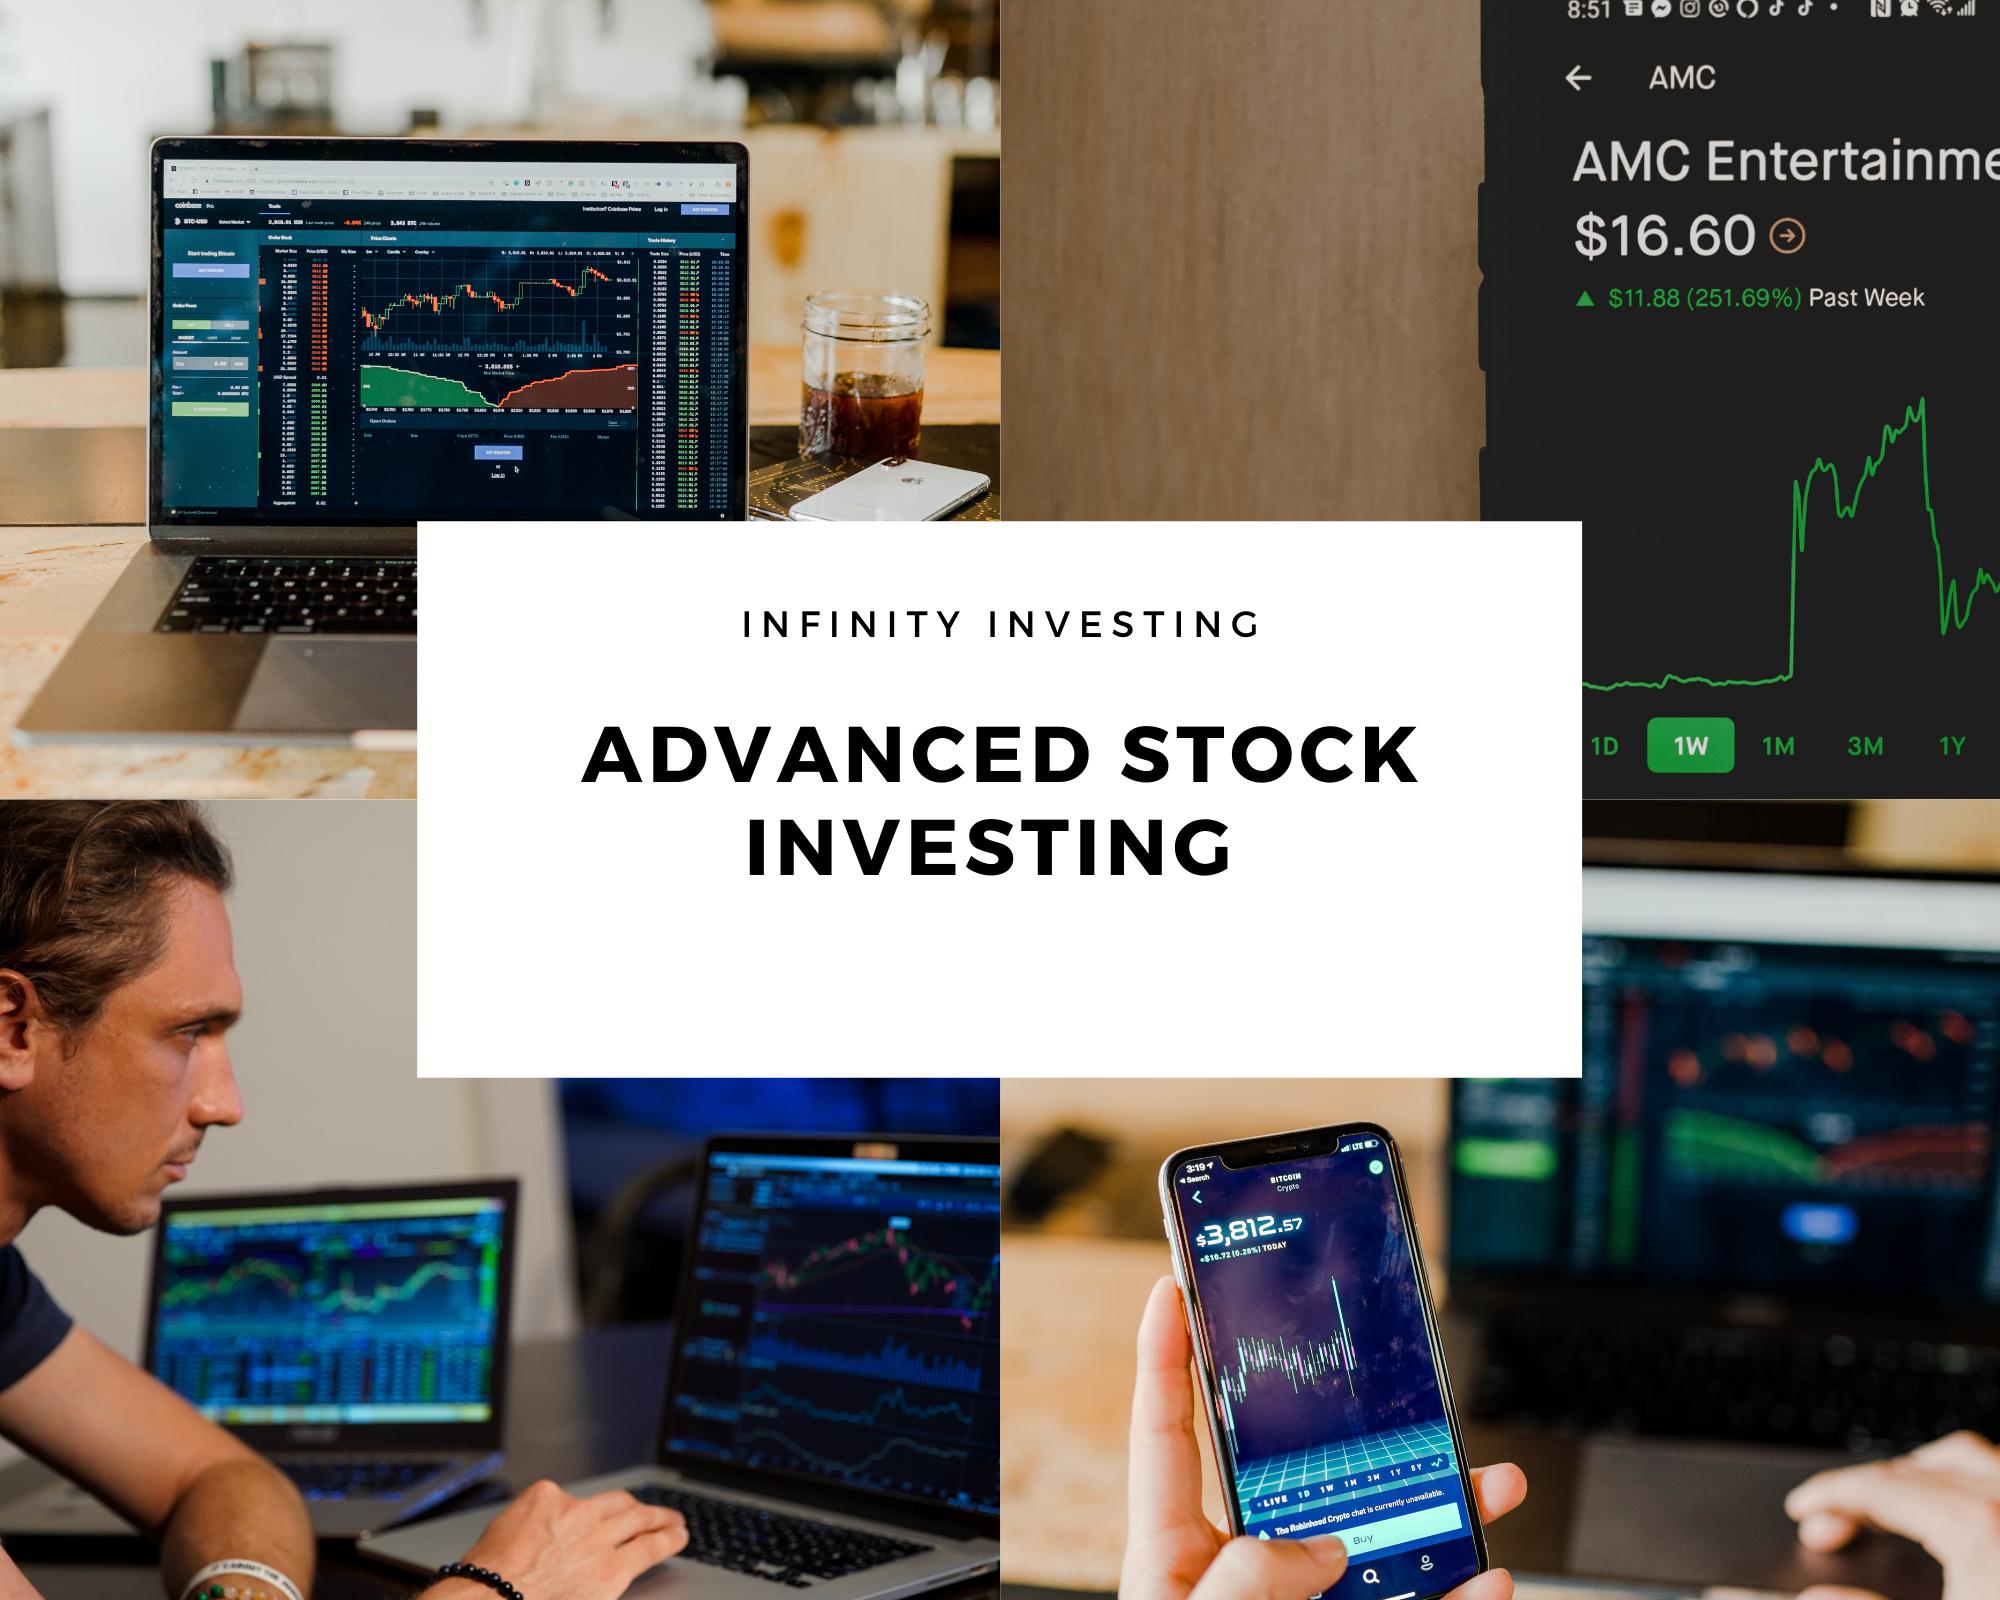 Advanced Stock Investing